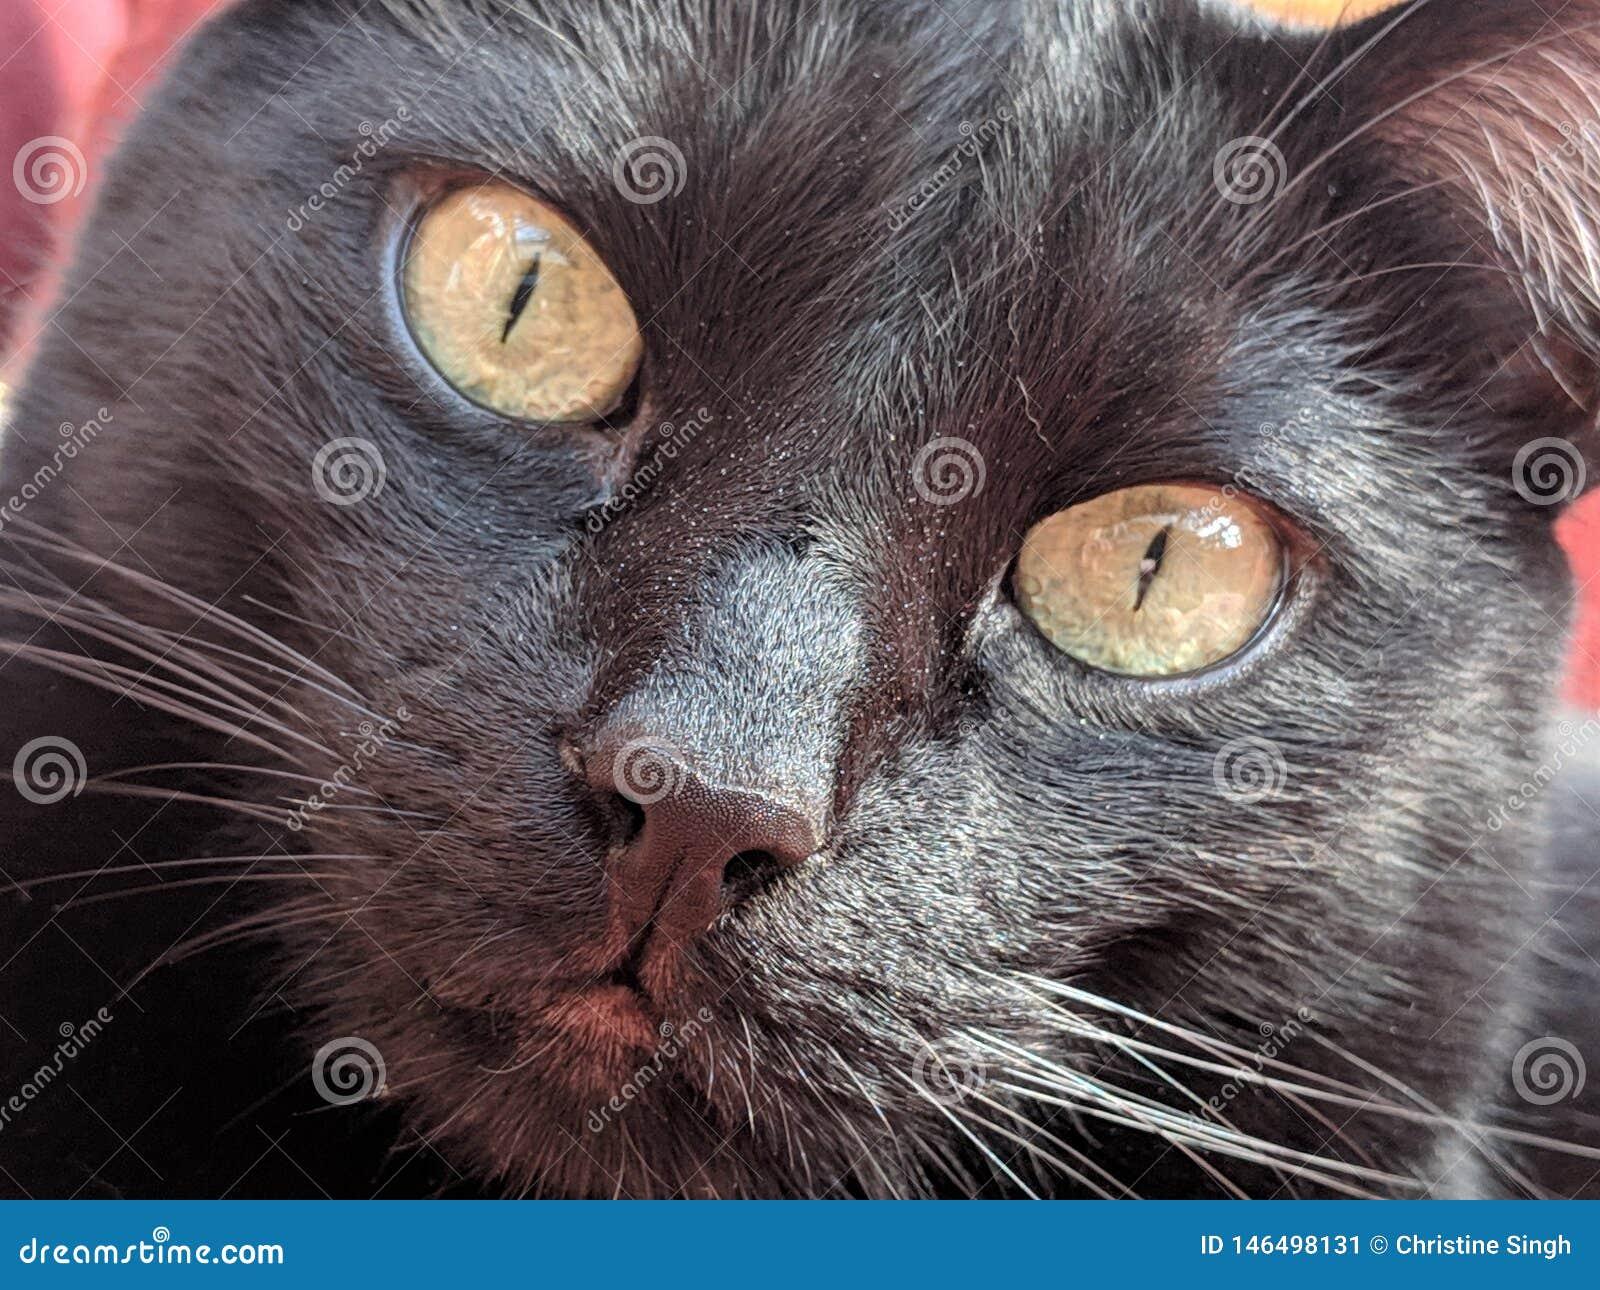 Little black cat watching